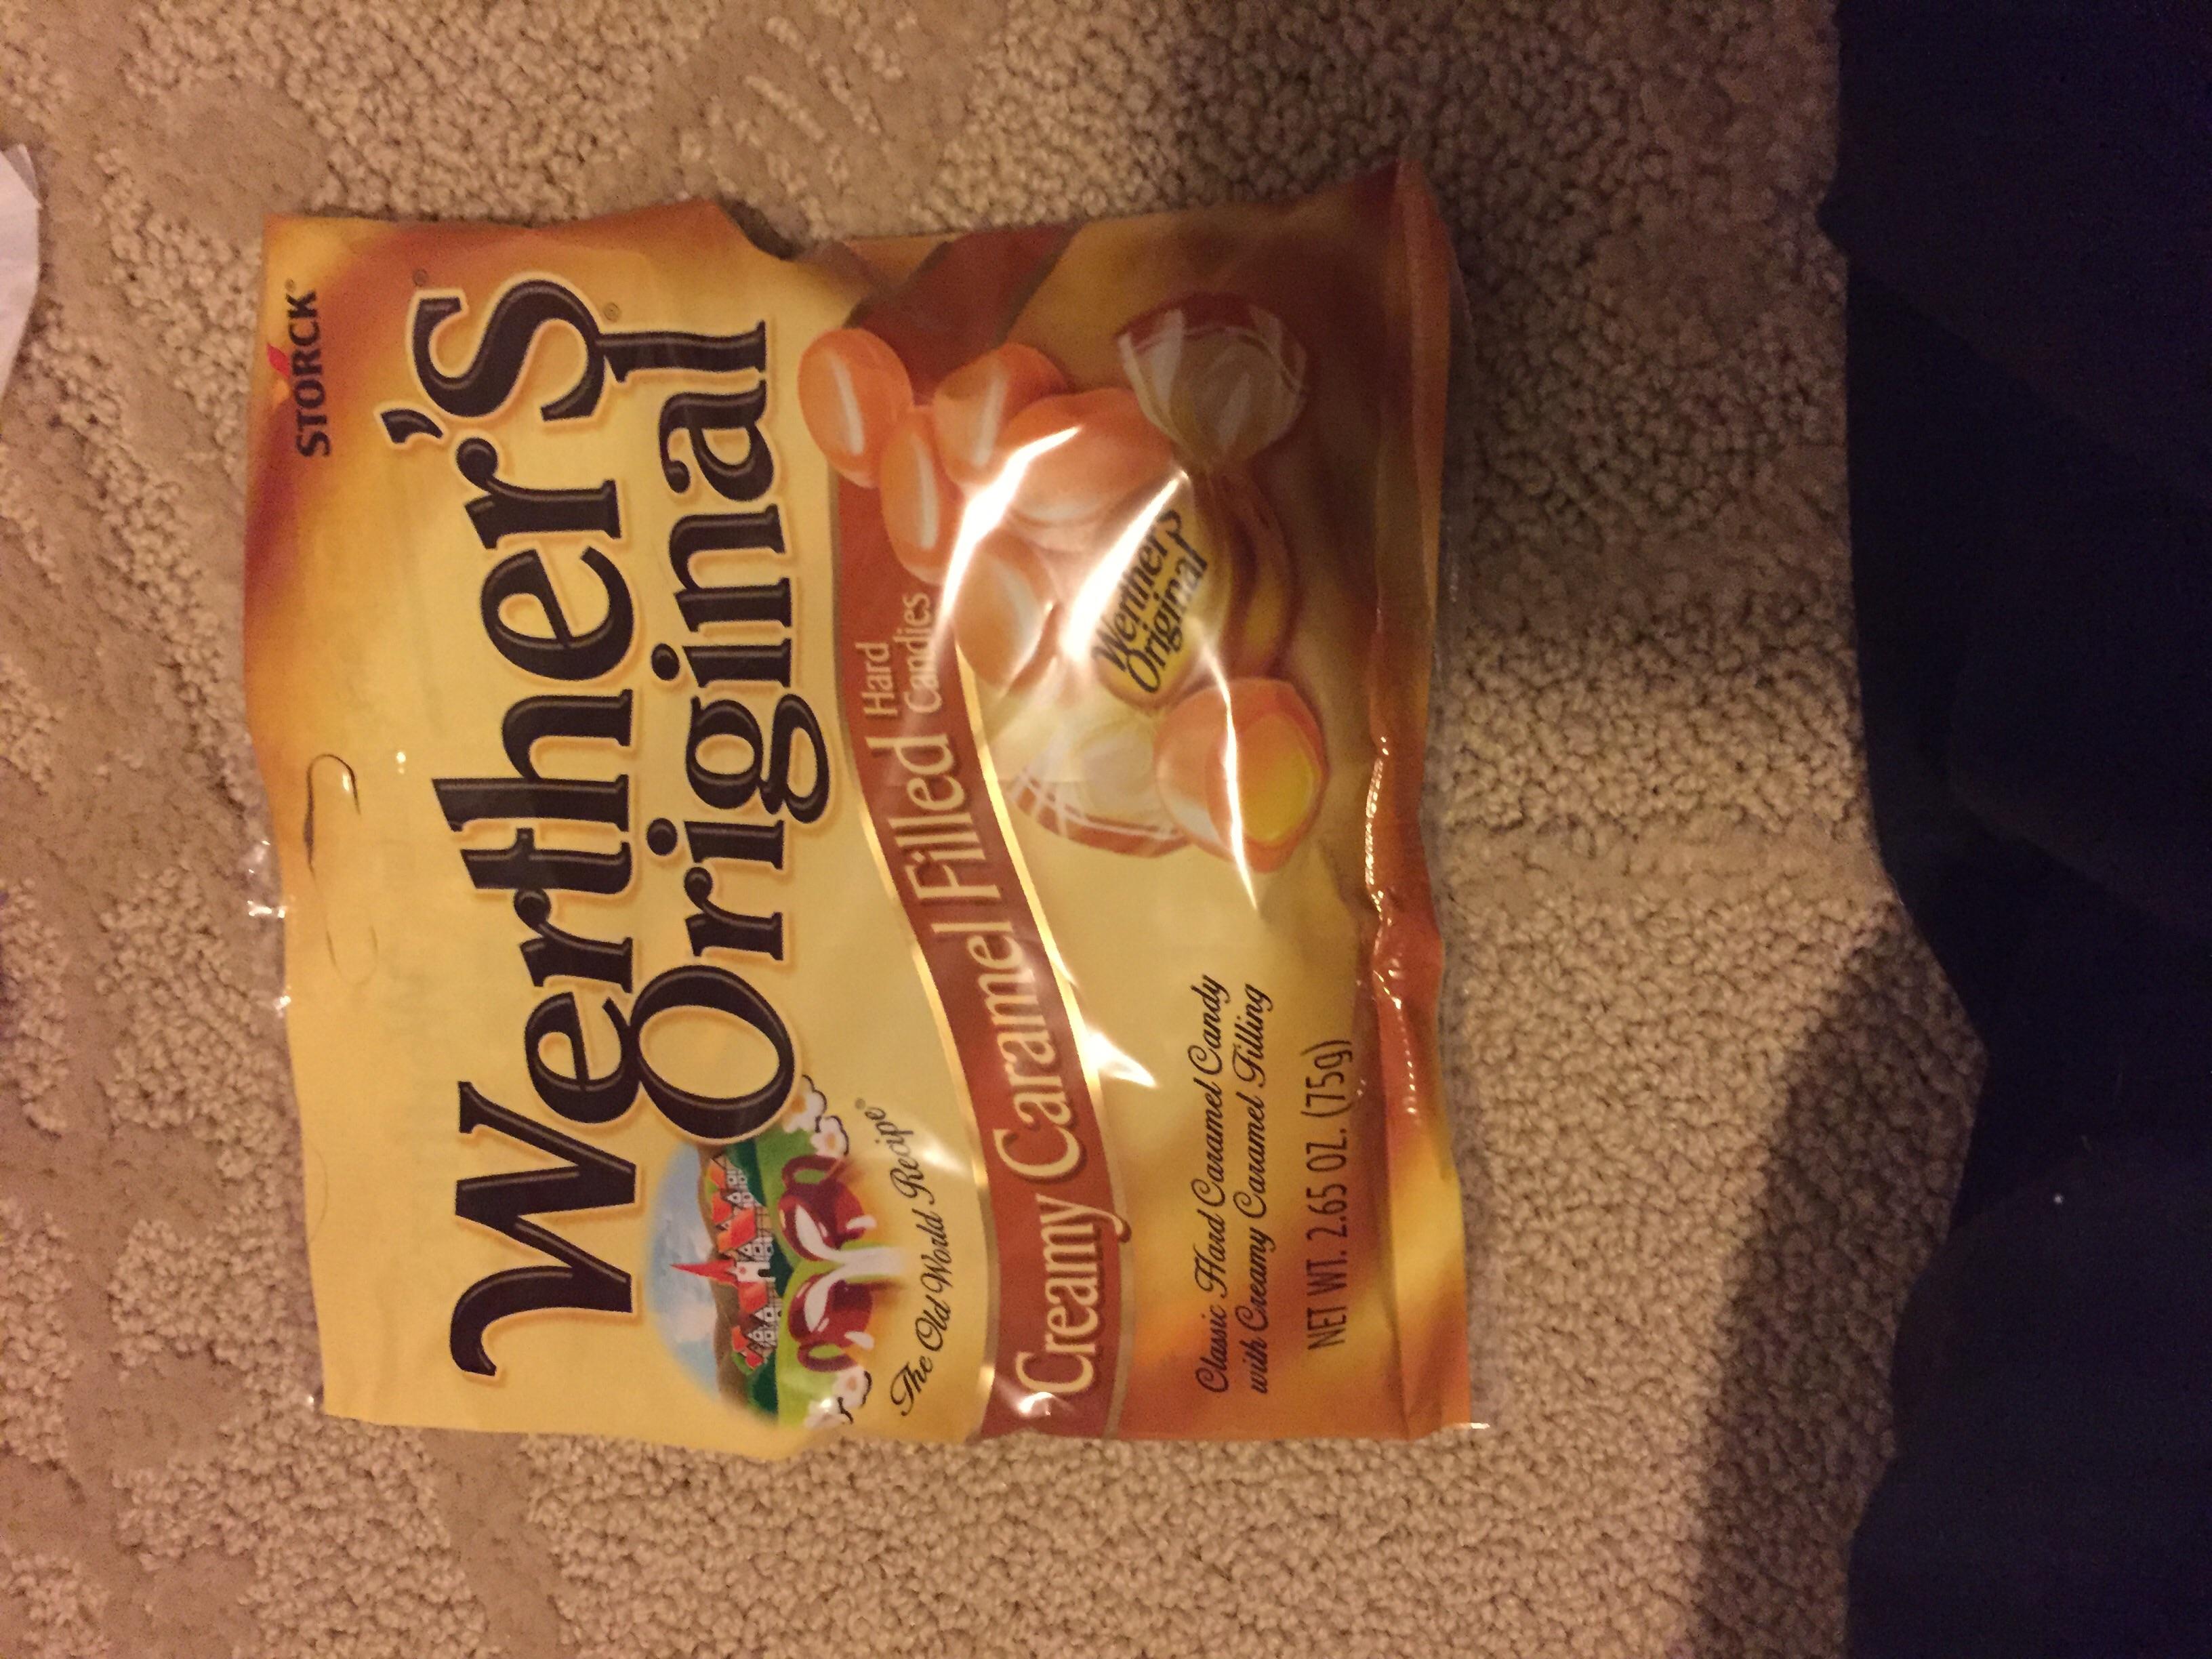 Werther's Original Creamy Caramel Filled uploaded by Brianna J.